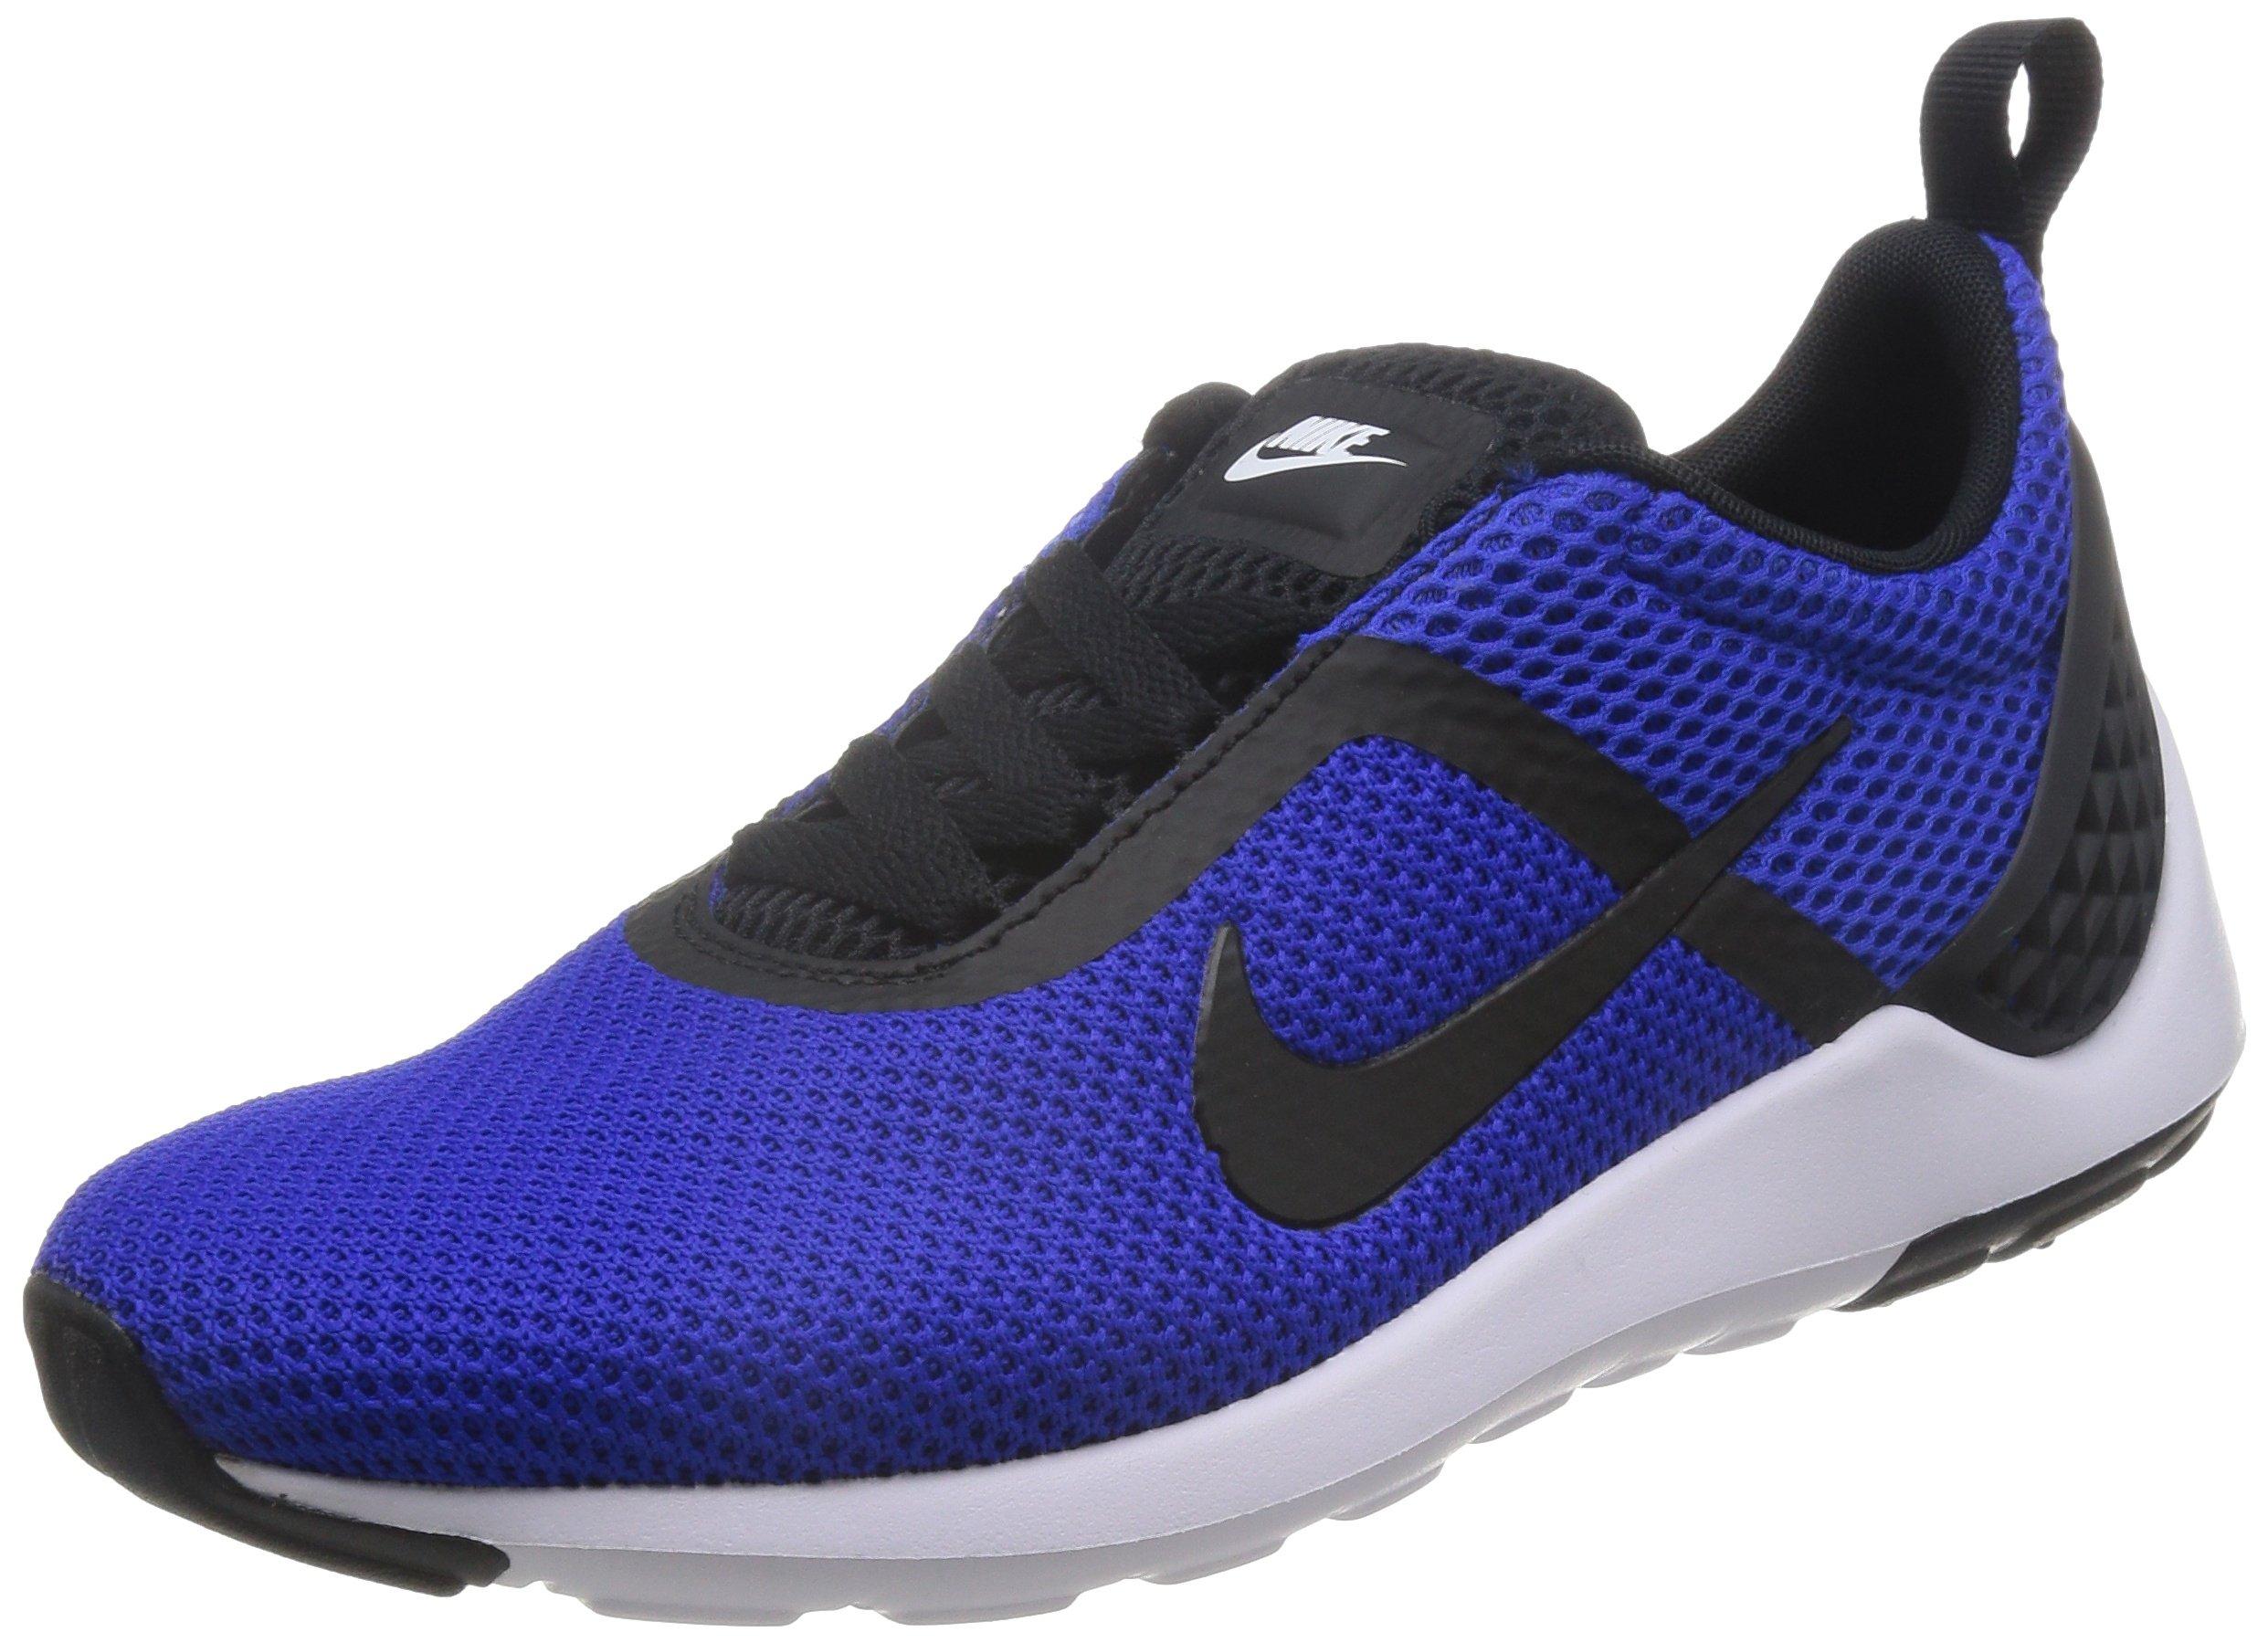 pavo exprimir Fácil de leer  Nike Lunarestoa 2 Essential Shoes- Buy Online in Angola at  angola.desertcart.com. ProductId : 119835990.